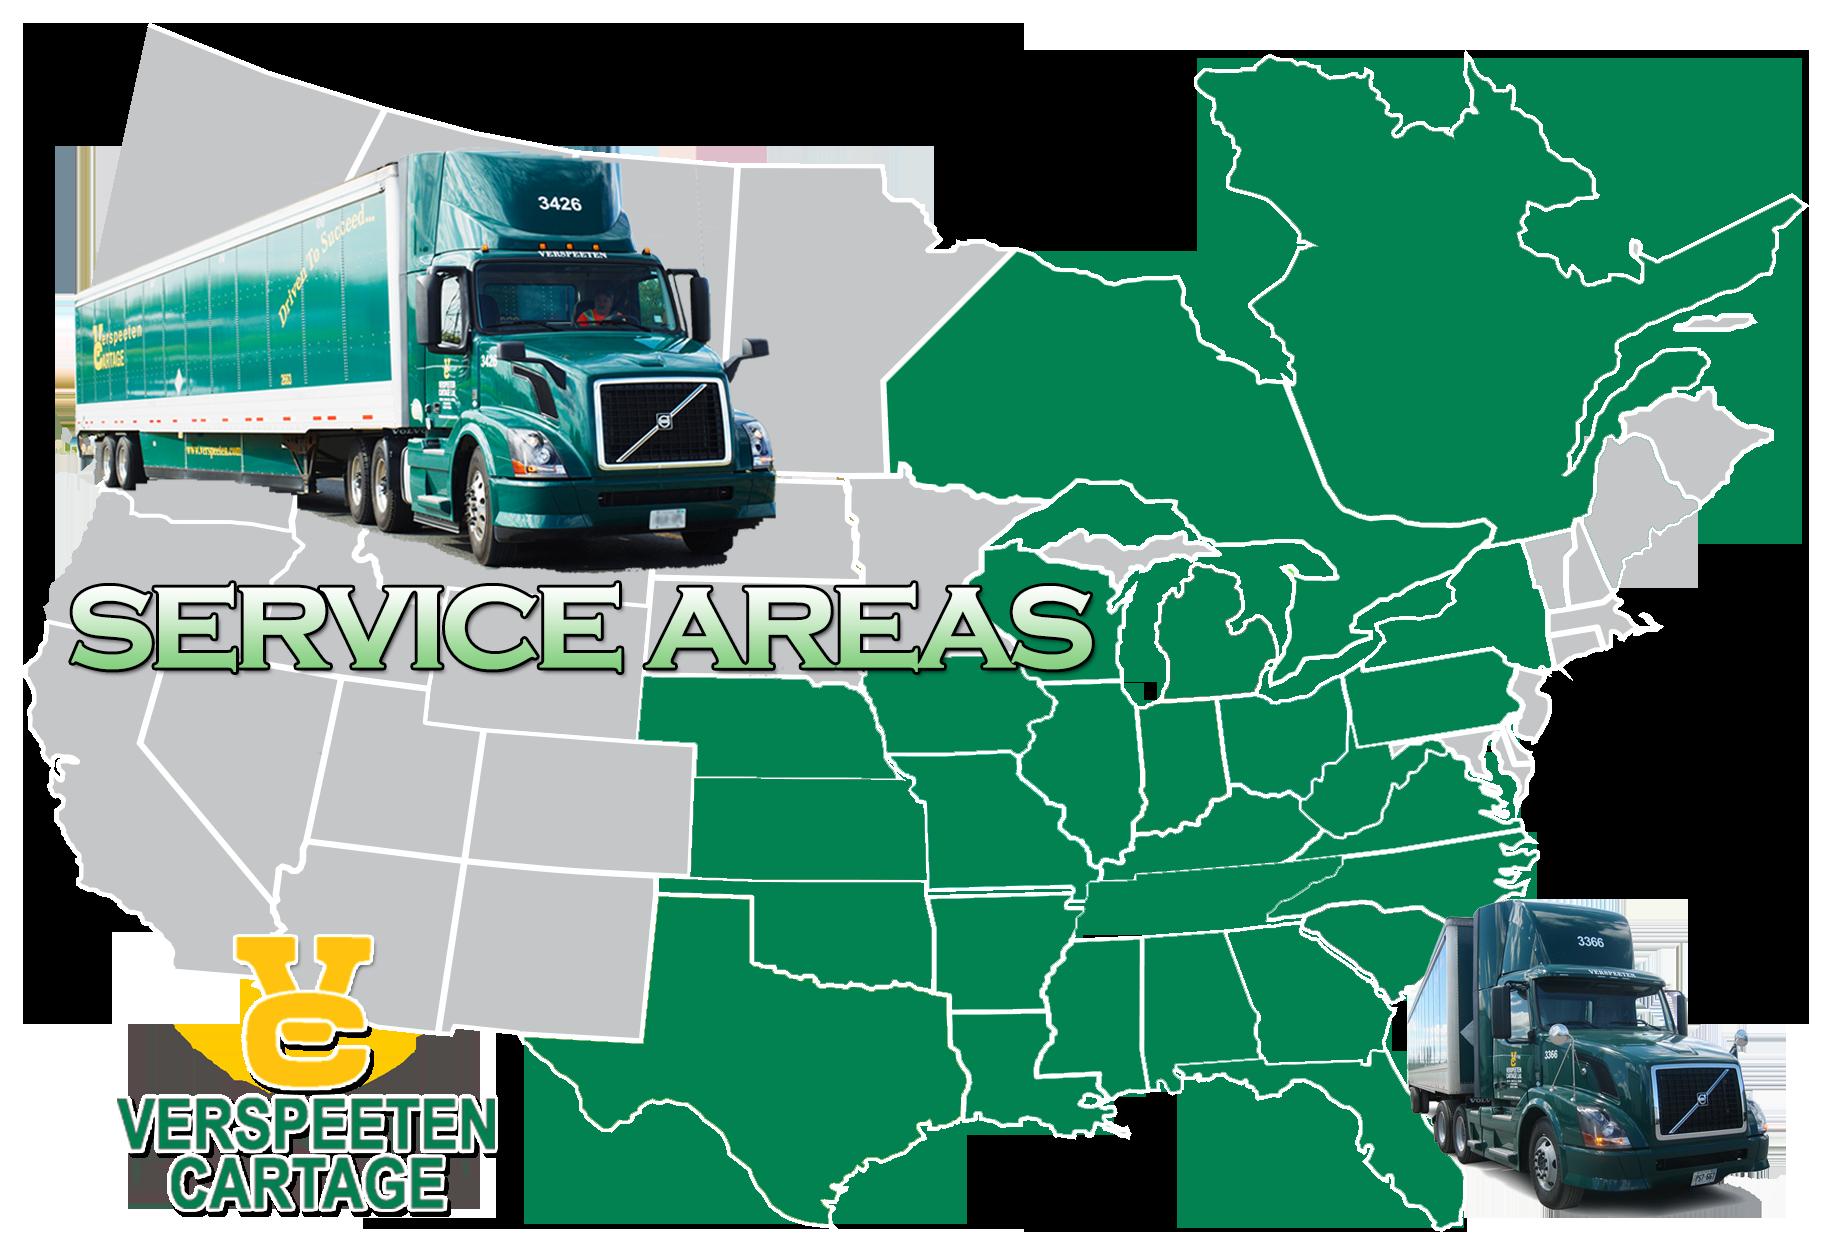 Ontario Truck Driving Jobs Ingersoll Careers Driving Truck